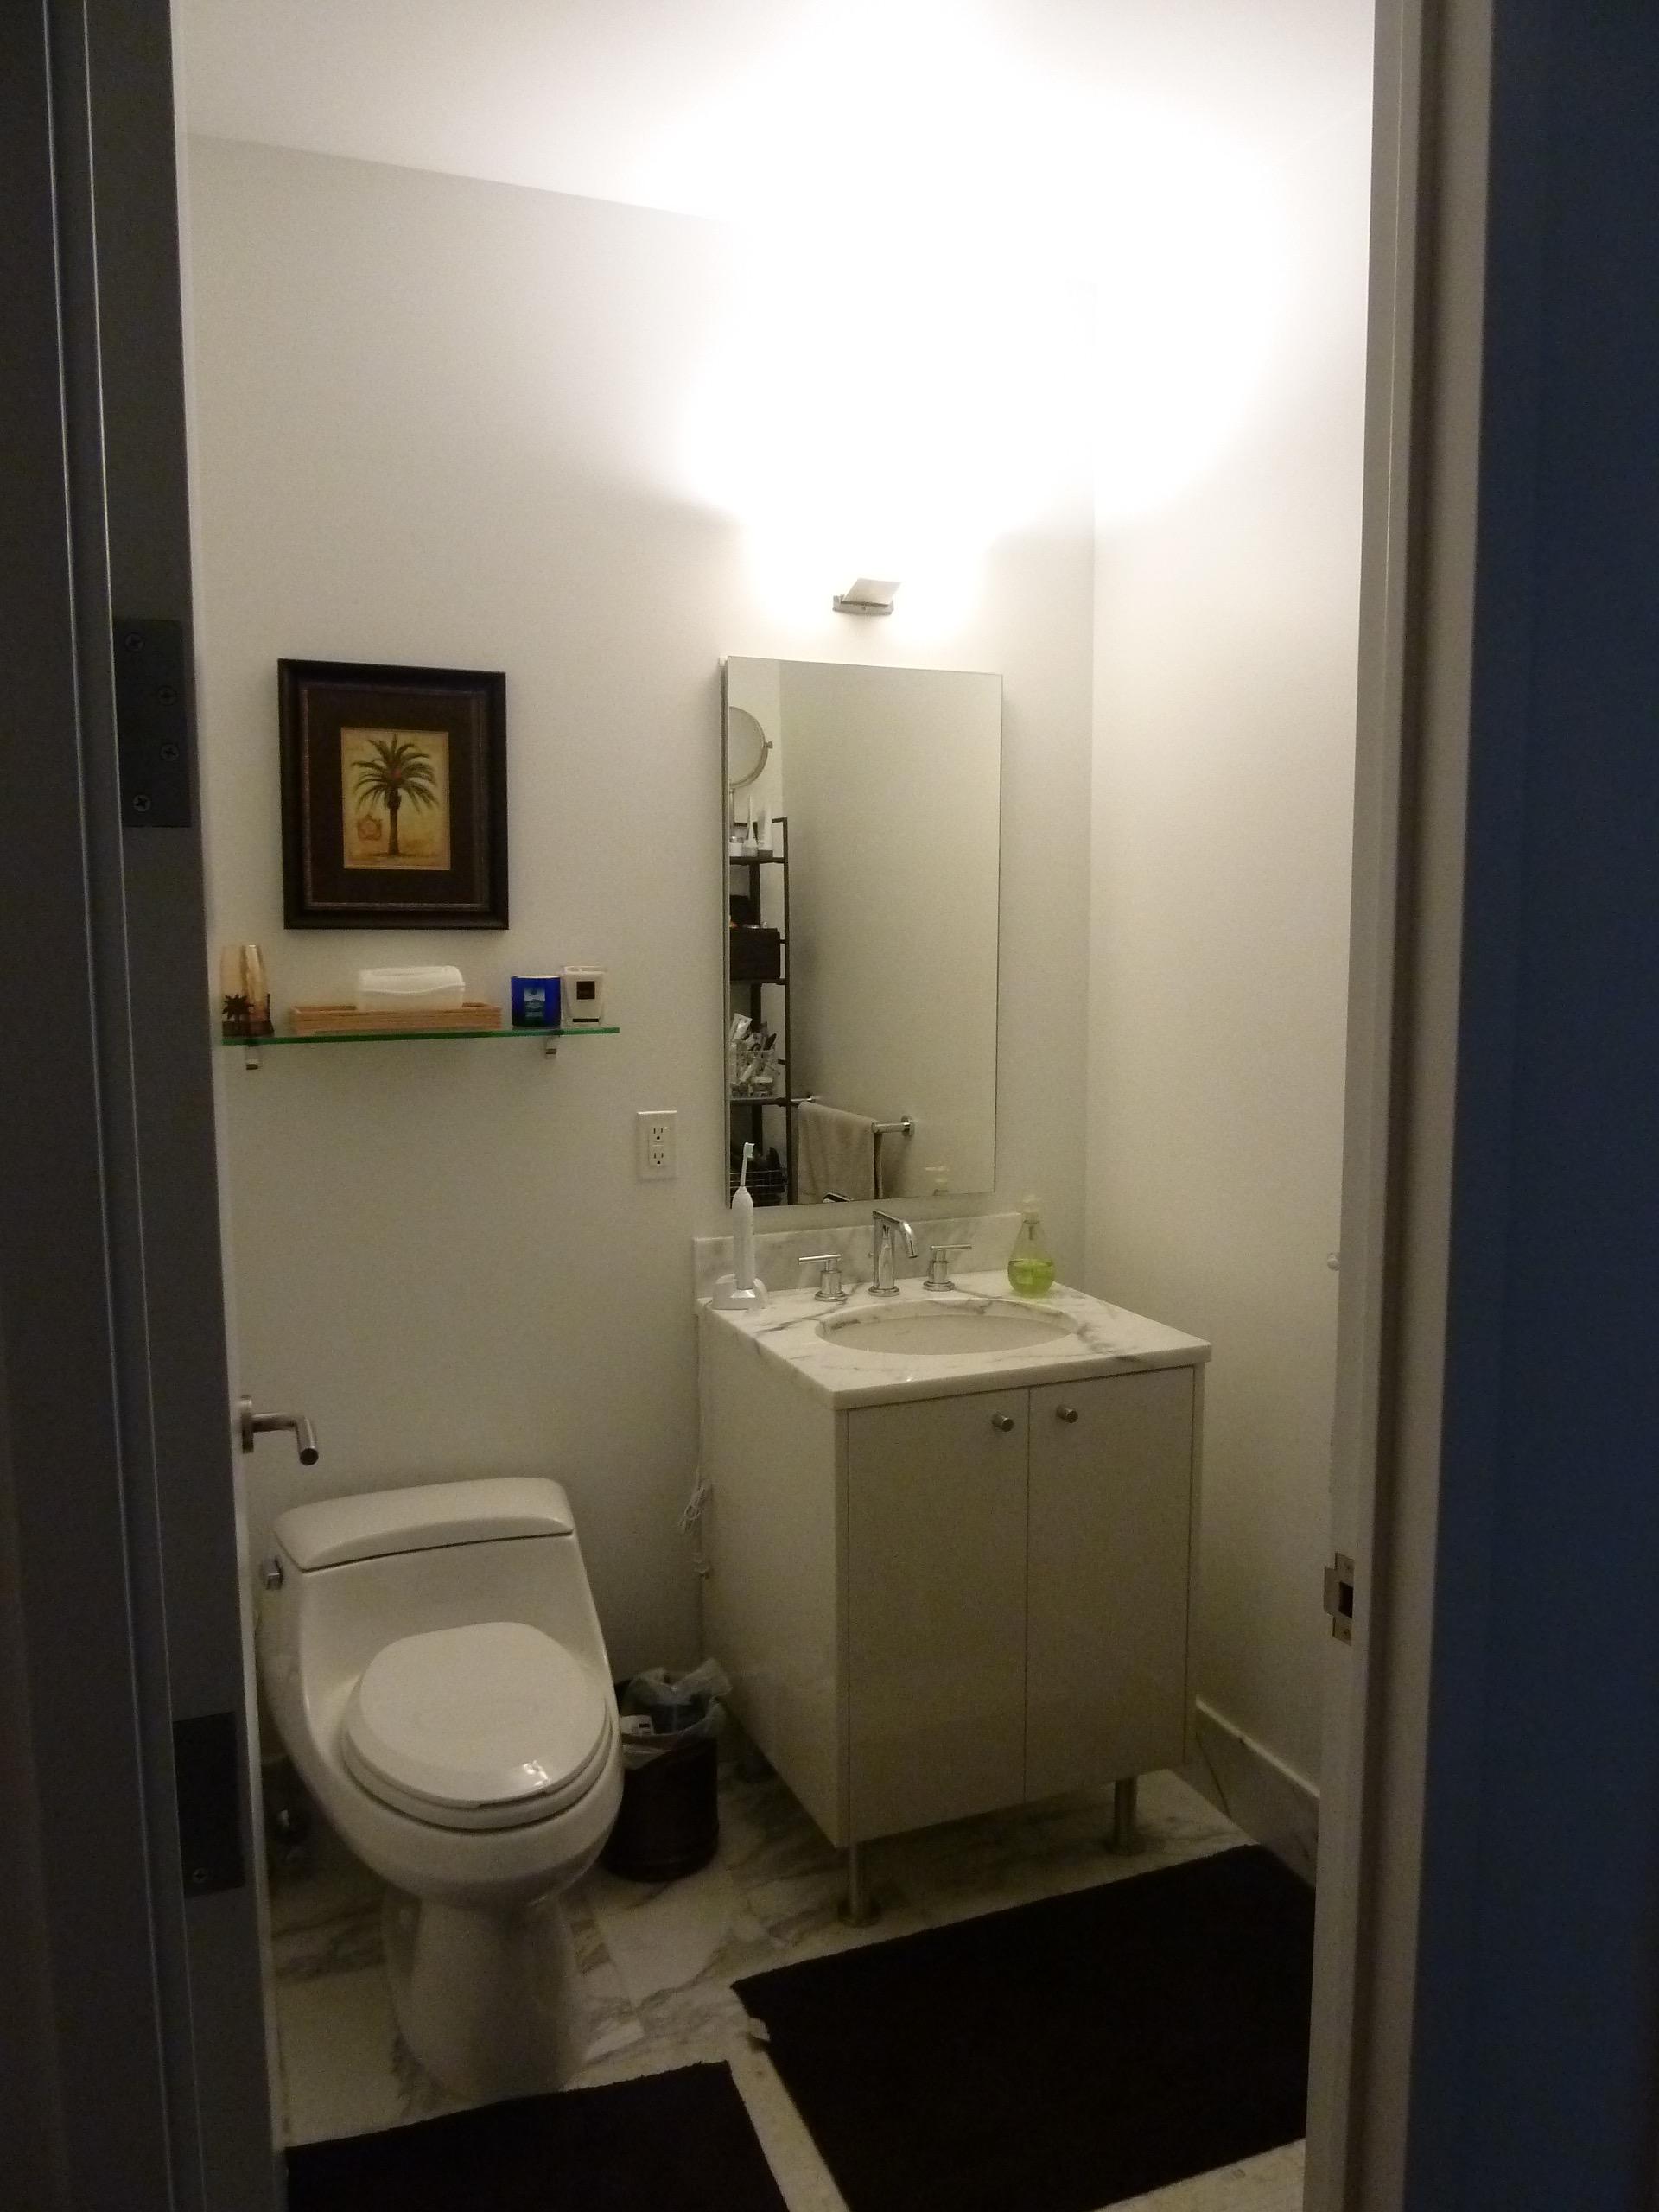 Bathroom design package before image